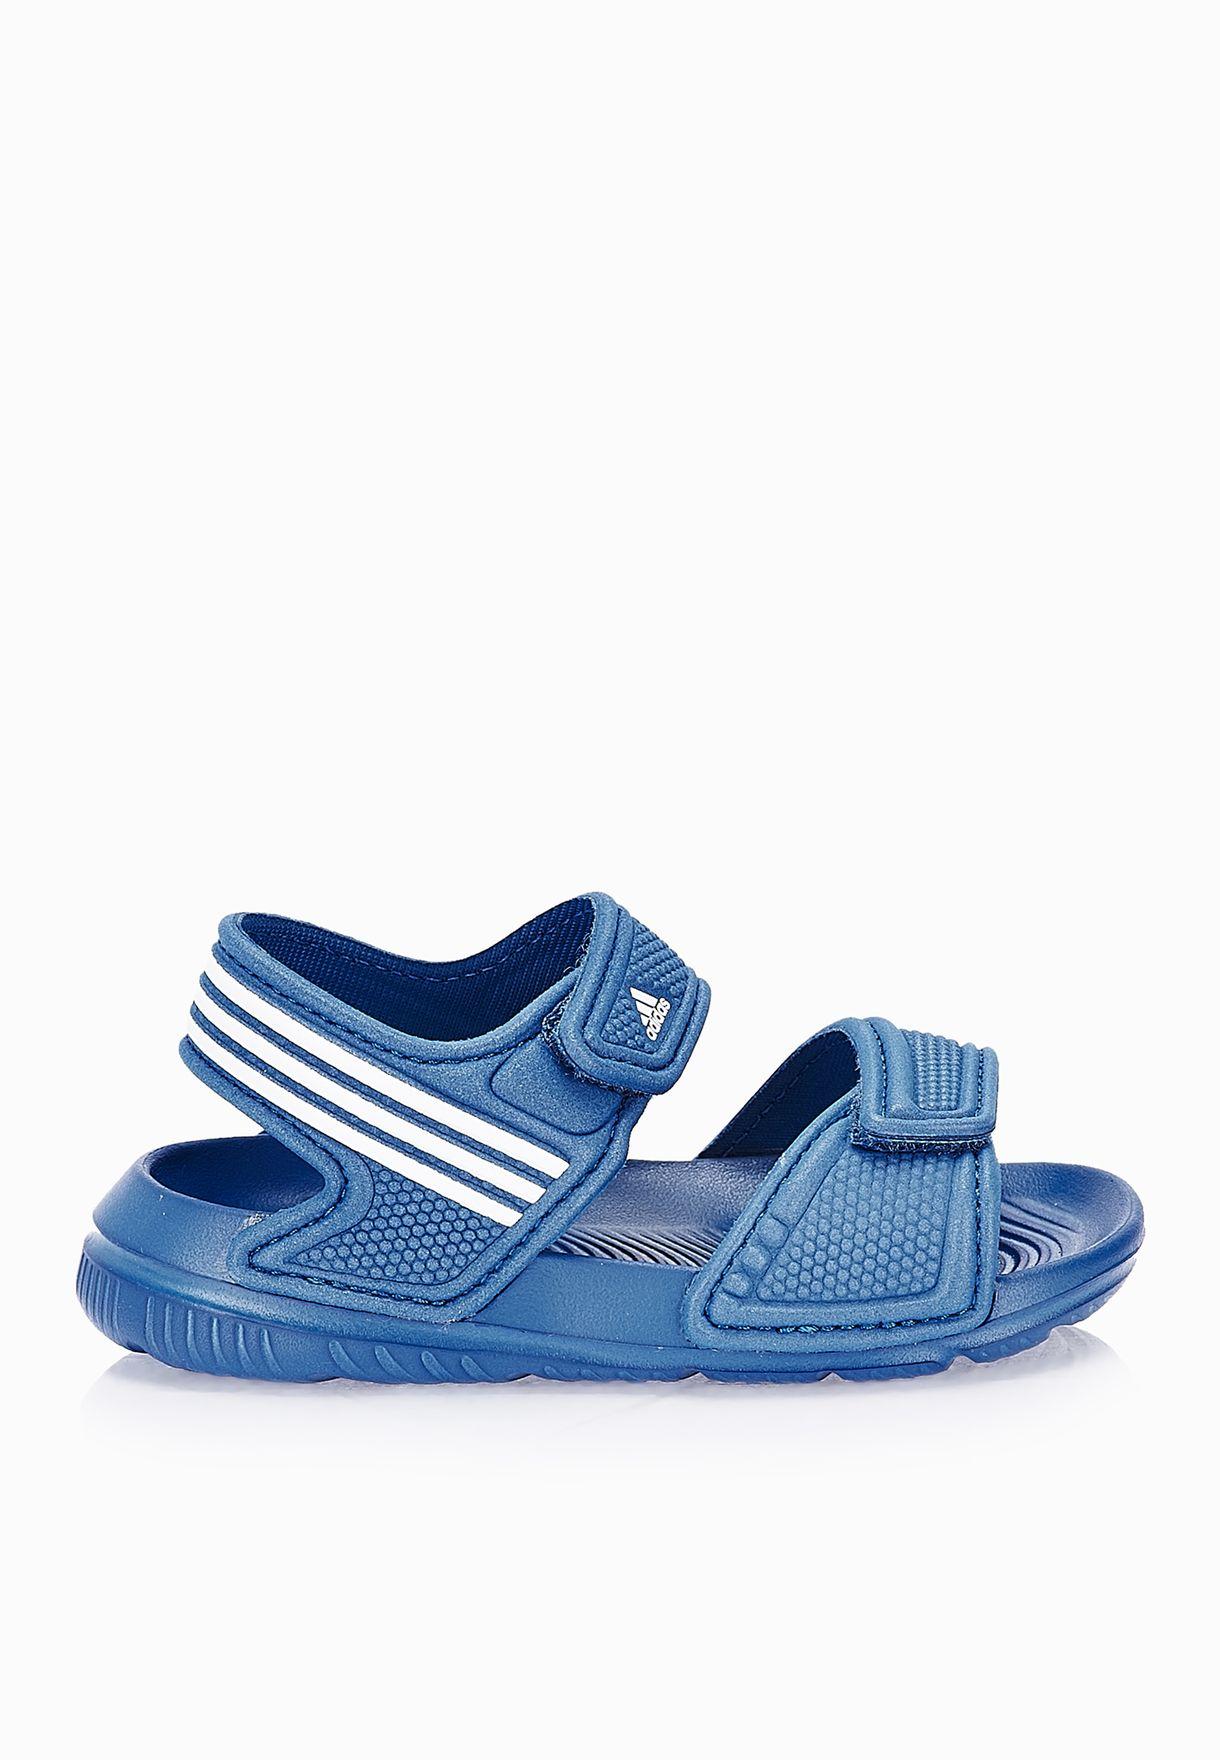 ddccb526d96c2 Shop adidas blue Akwah 9 Infant S74680 for Kids in UAE - AD476SH31TYQ